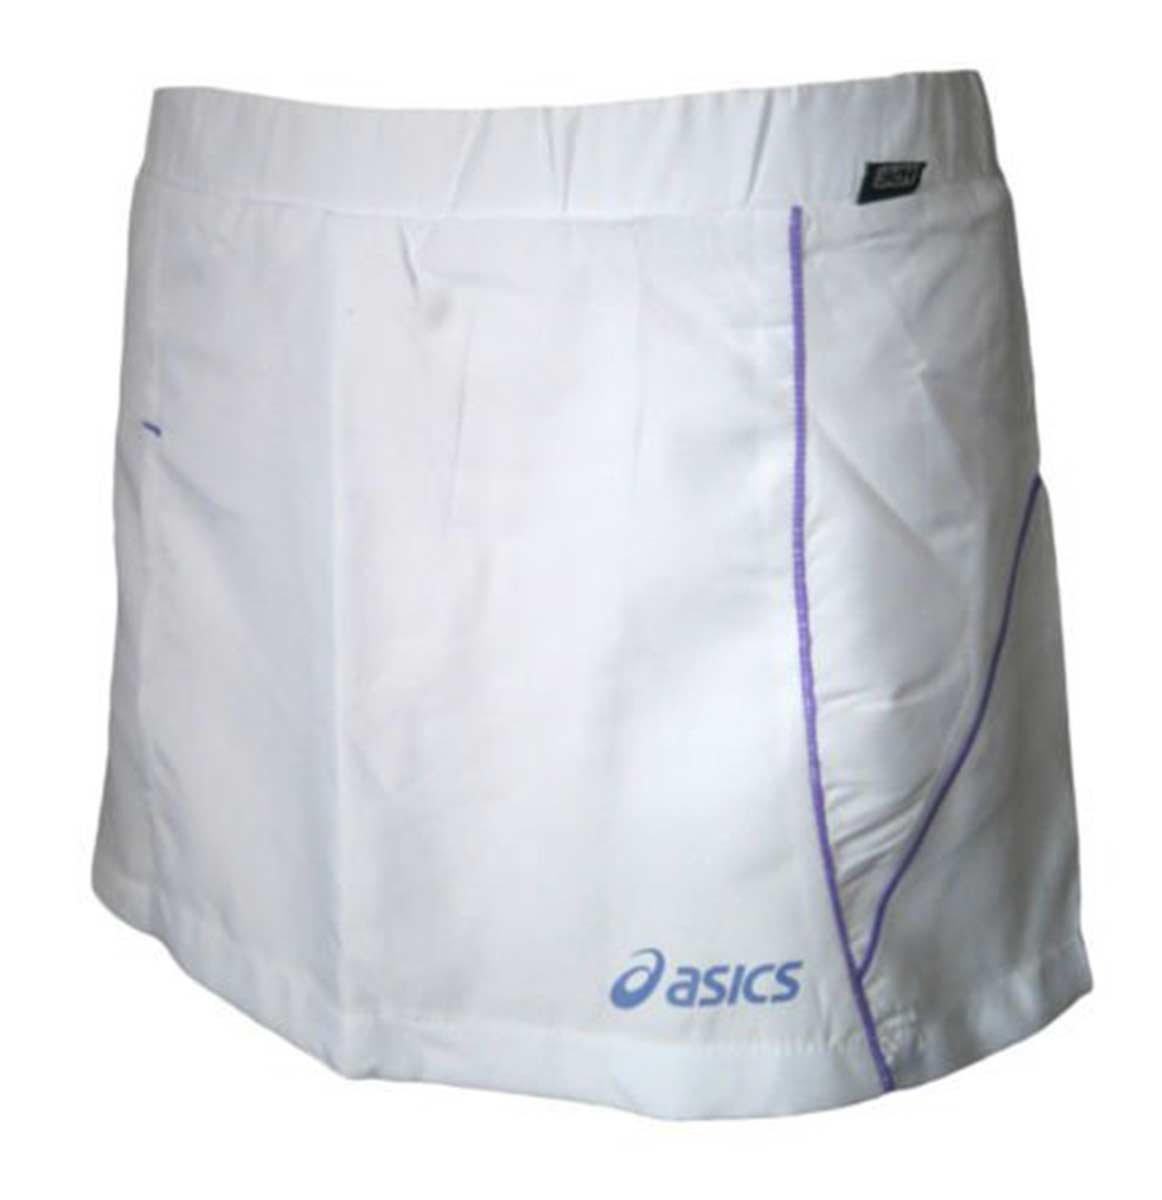 ASICS Raqueta DE Tenis PANTALÓN/Falda Blanca, Color Blanco ...